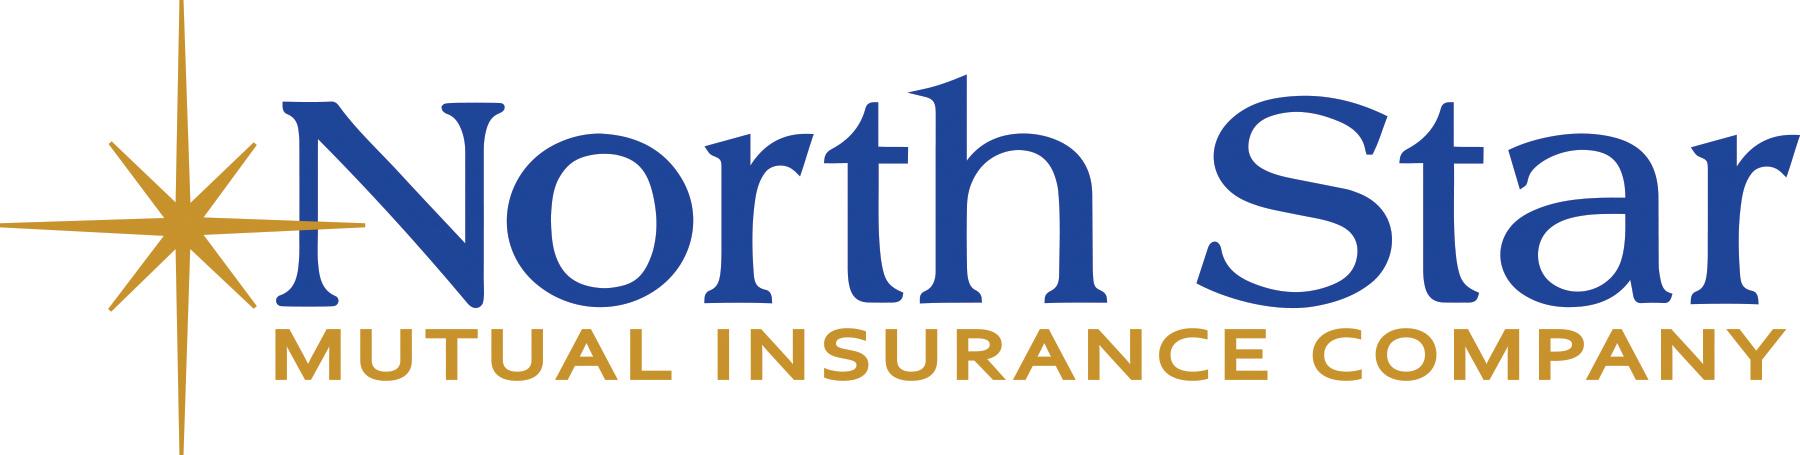 North Star Mutual Insurance Company